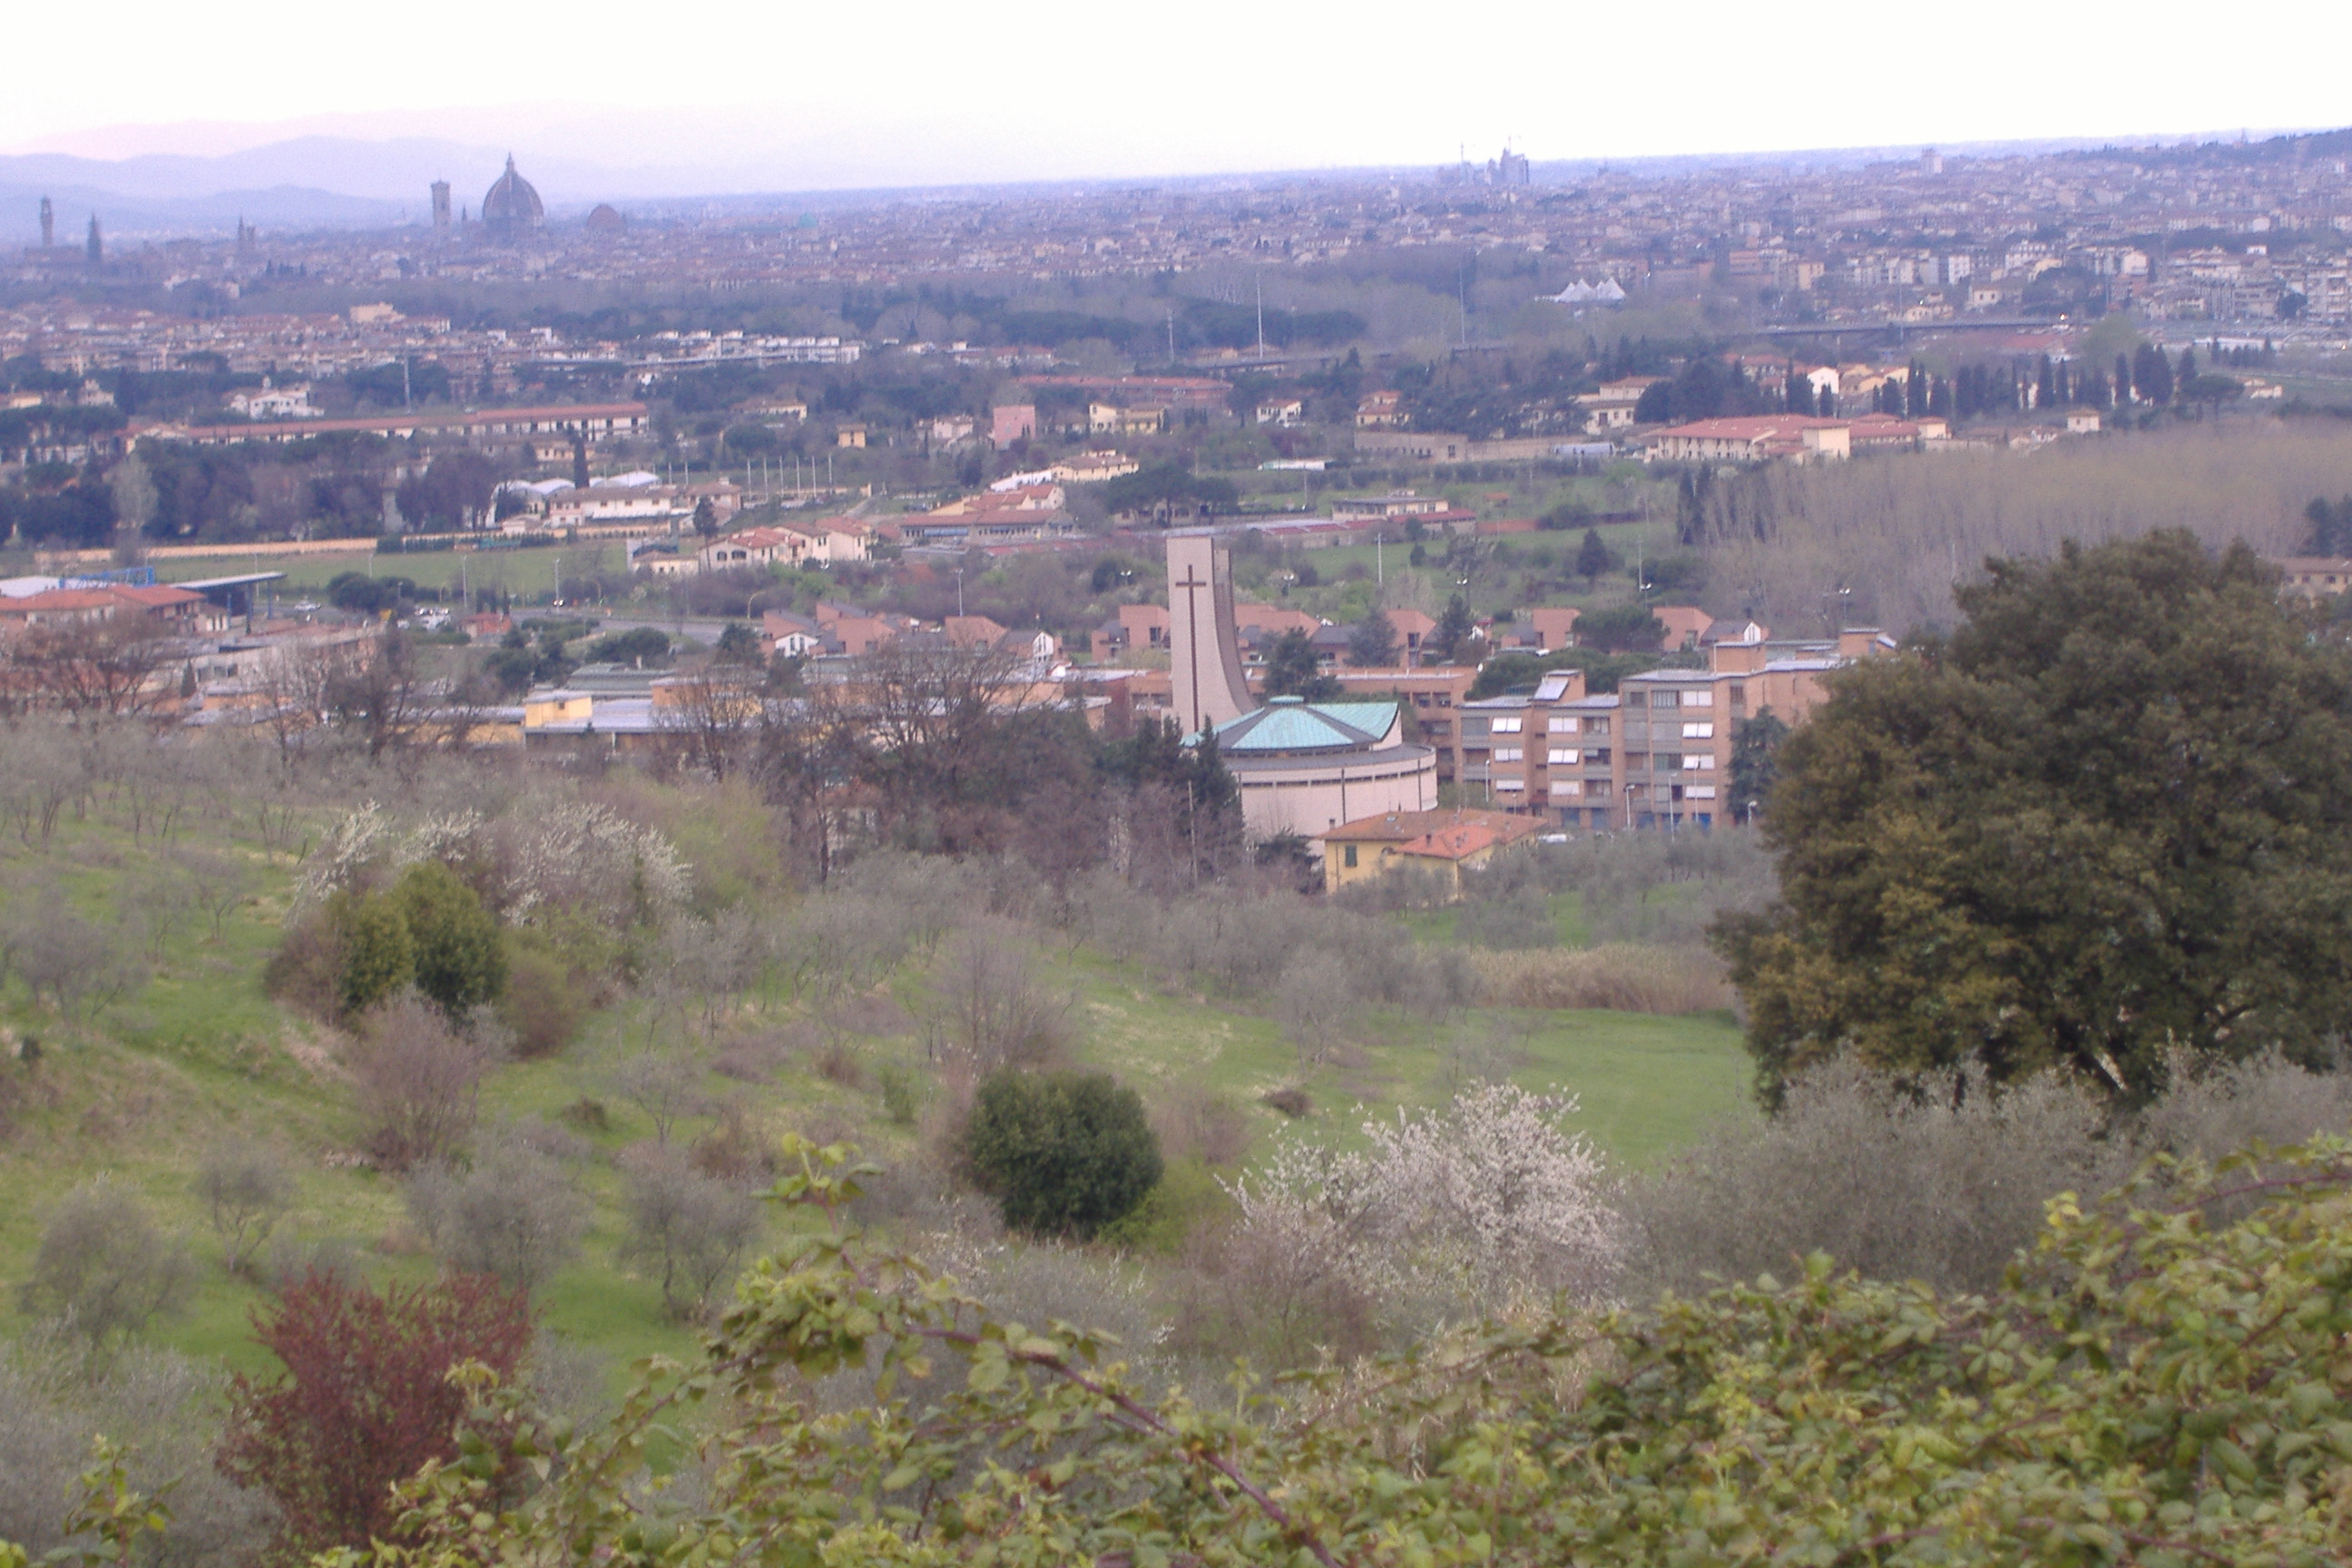 File:Bagno a Ripoli - Panorama.JPG - Wikimedia Commons